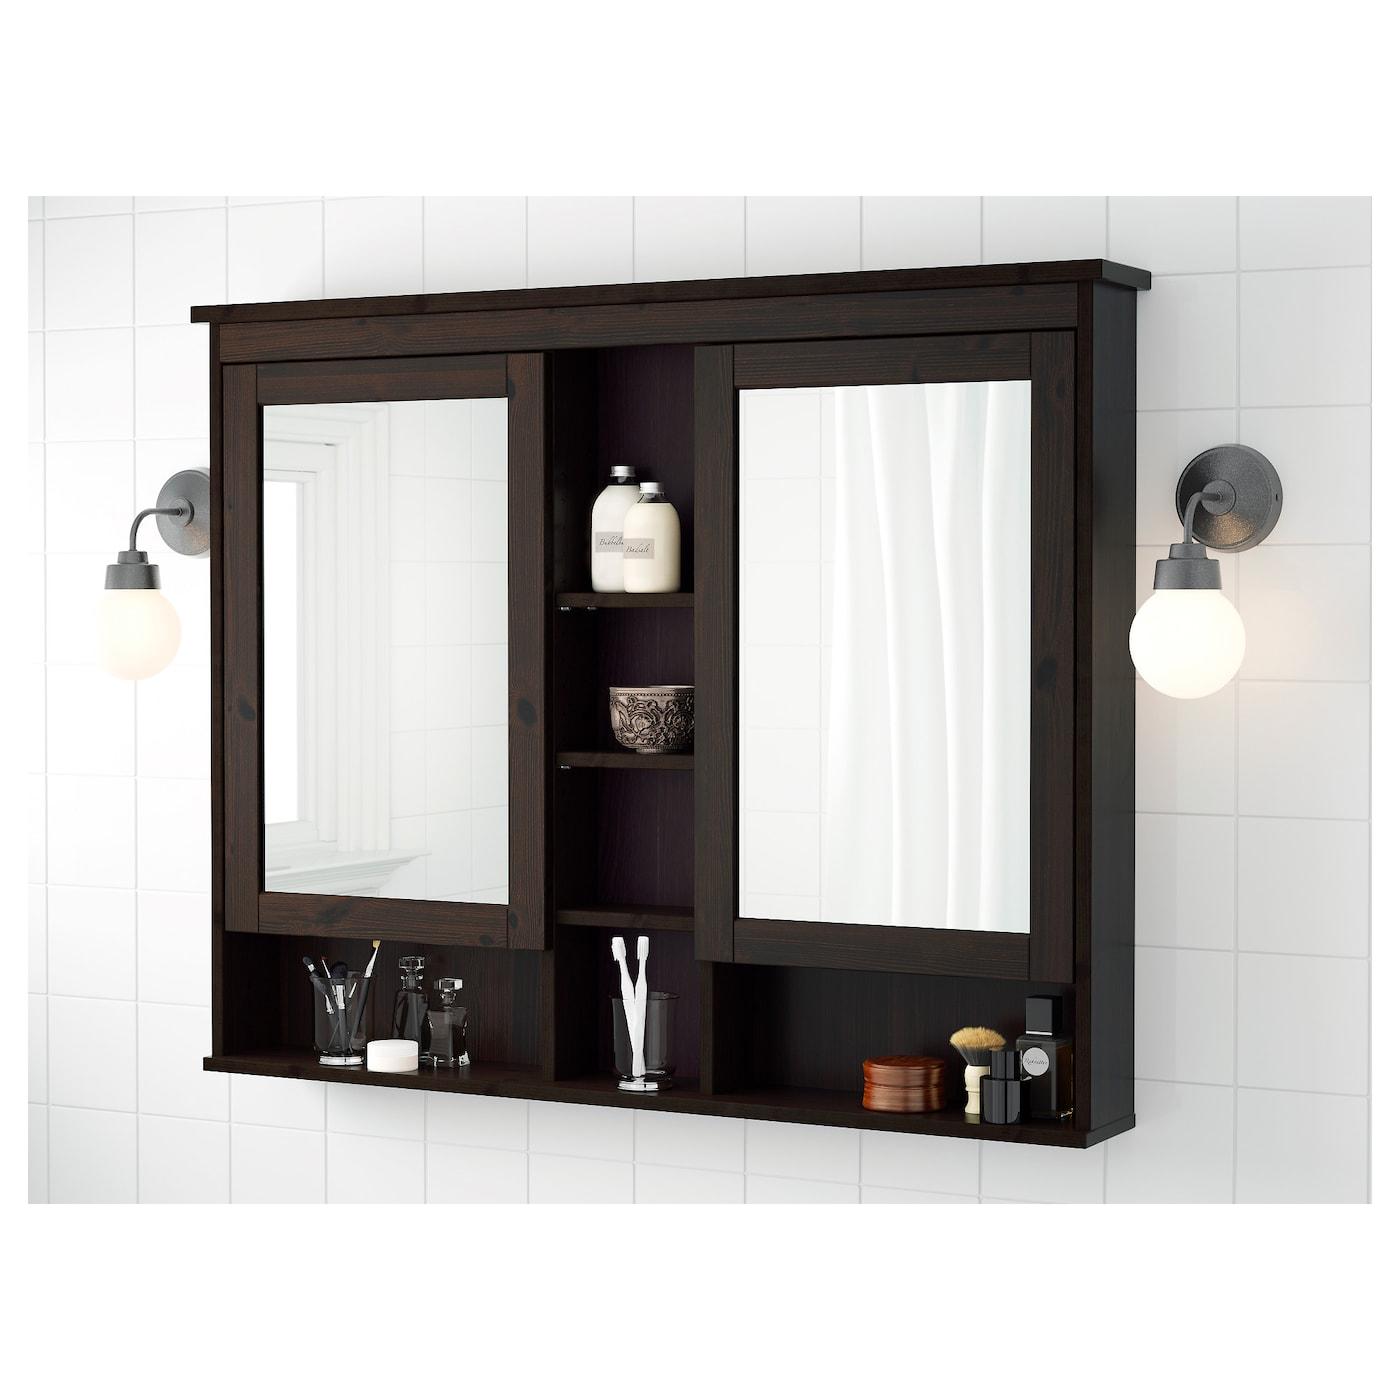 Hemnes Mirror Cabinet With 2 Doors Black Brown Stain 47 1 4x38 5 8 Ikea